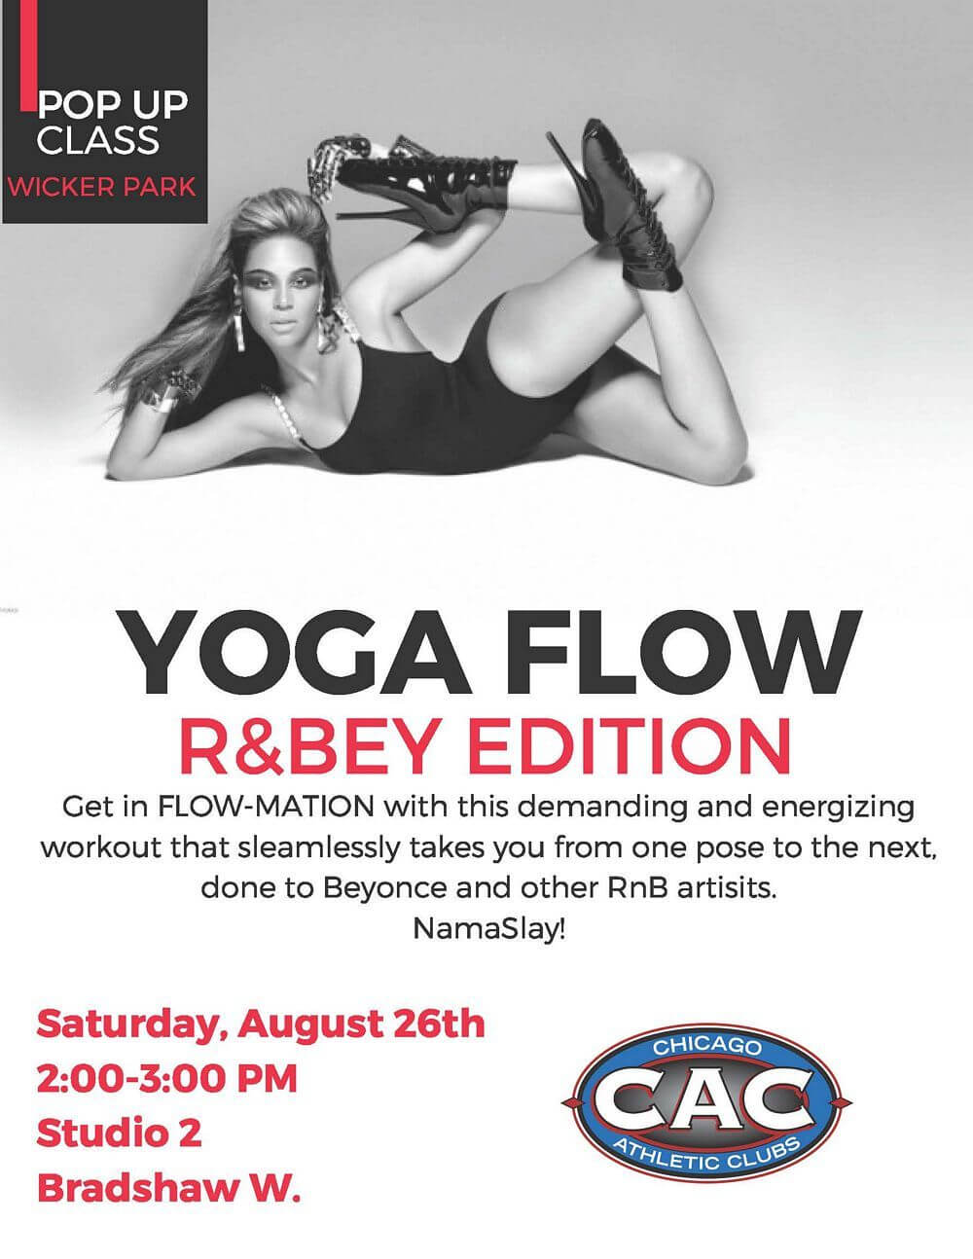 POP UP Yoga Flow R&BEy WPAC.jpg